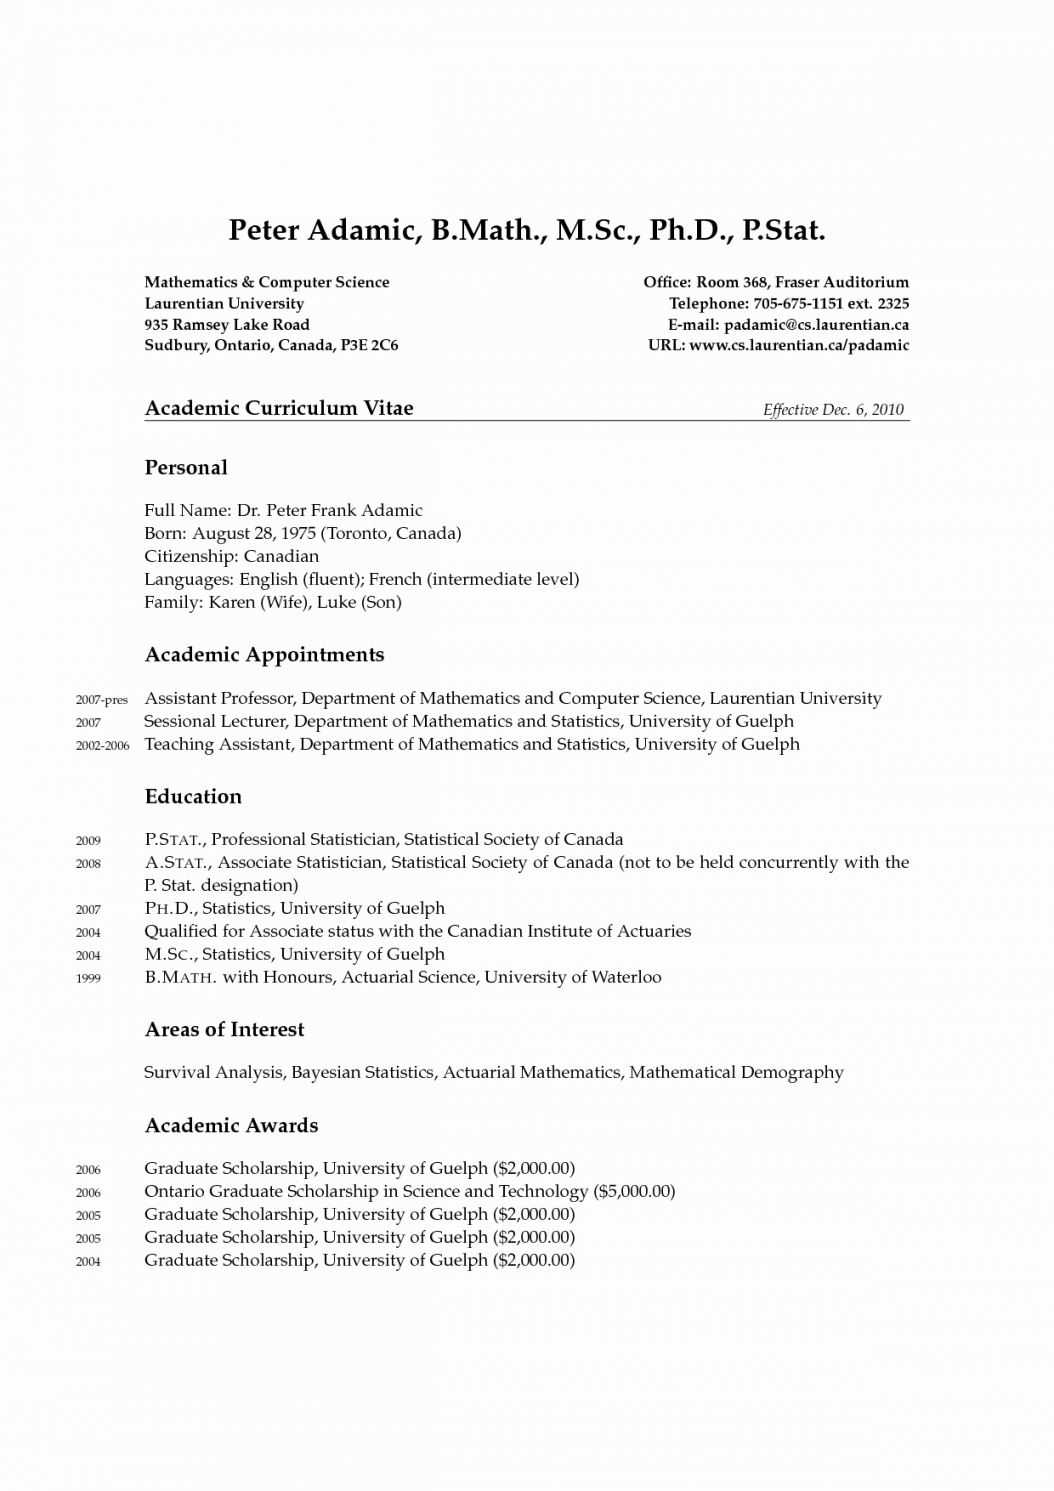 Cv Template Latex Phd